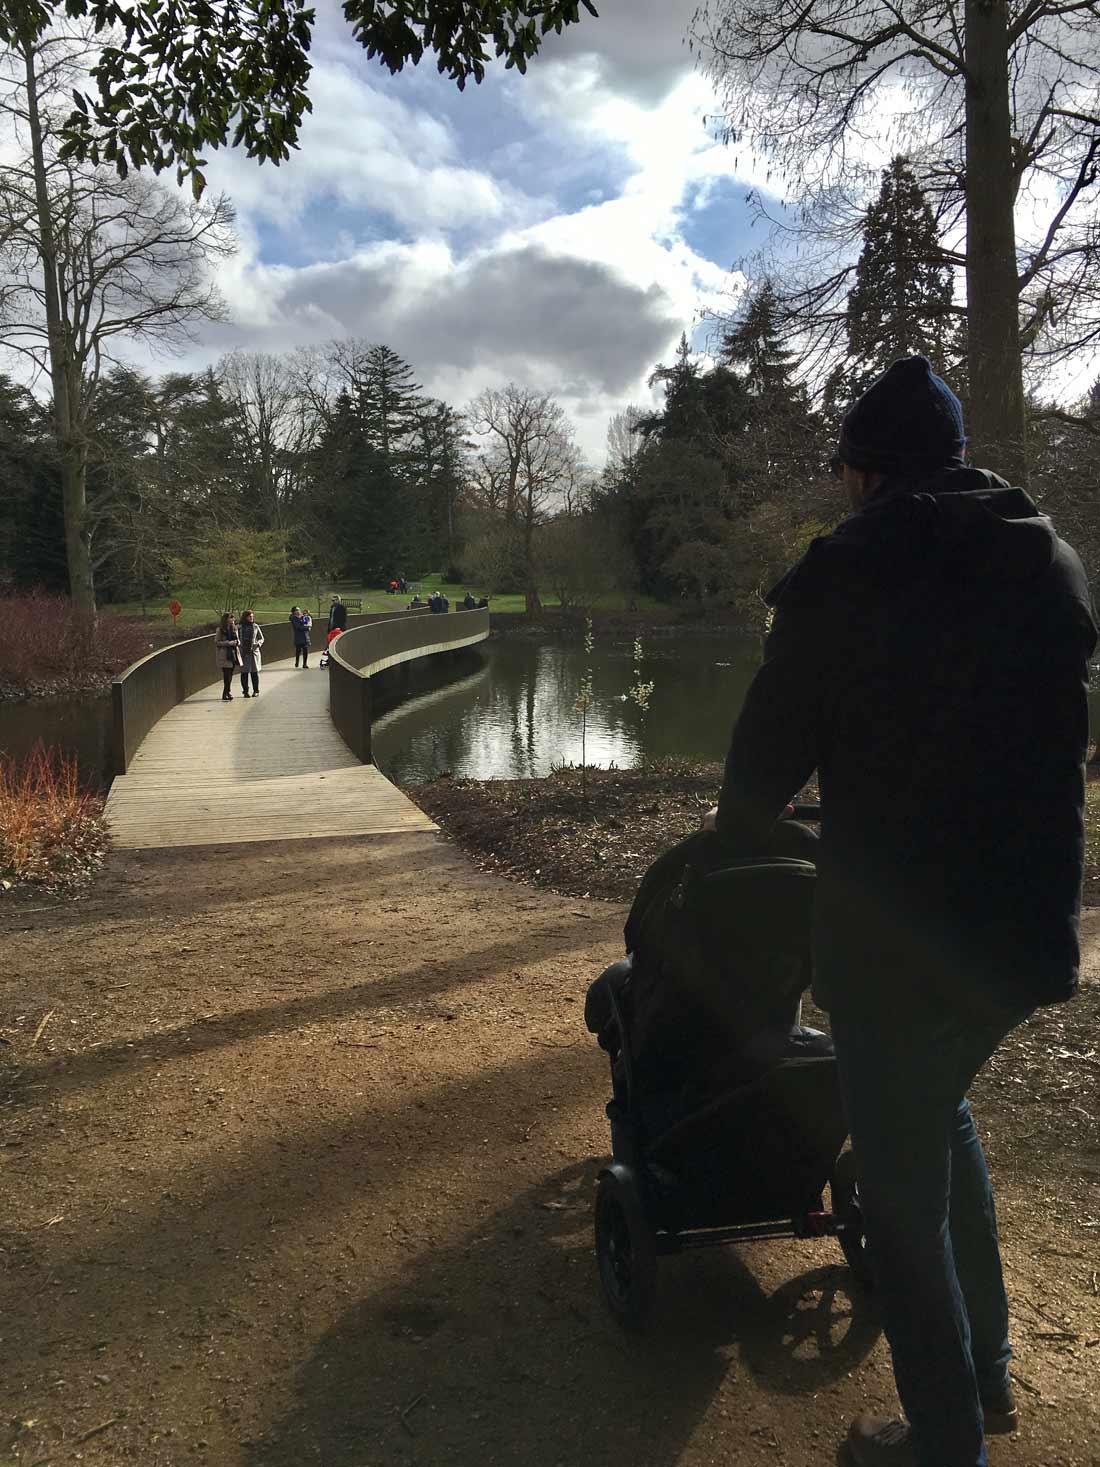 kew-gardens-review